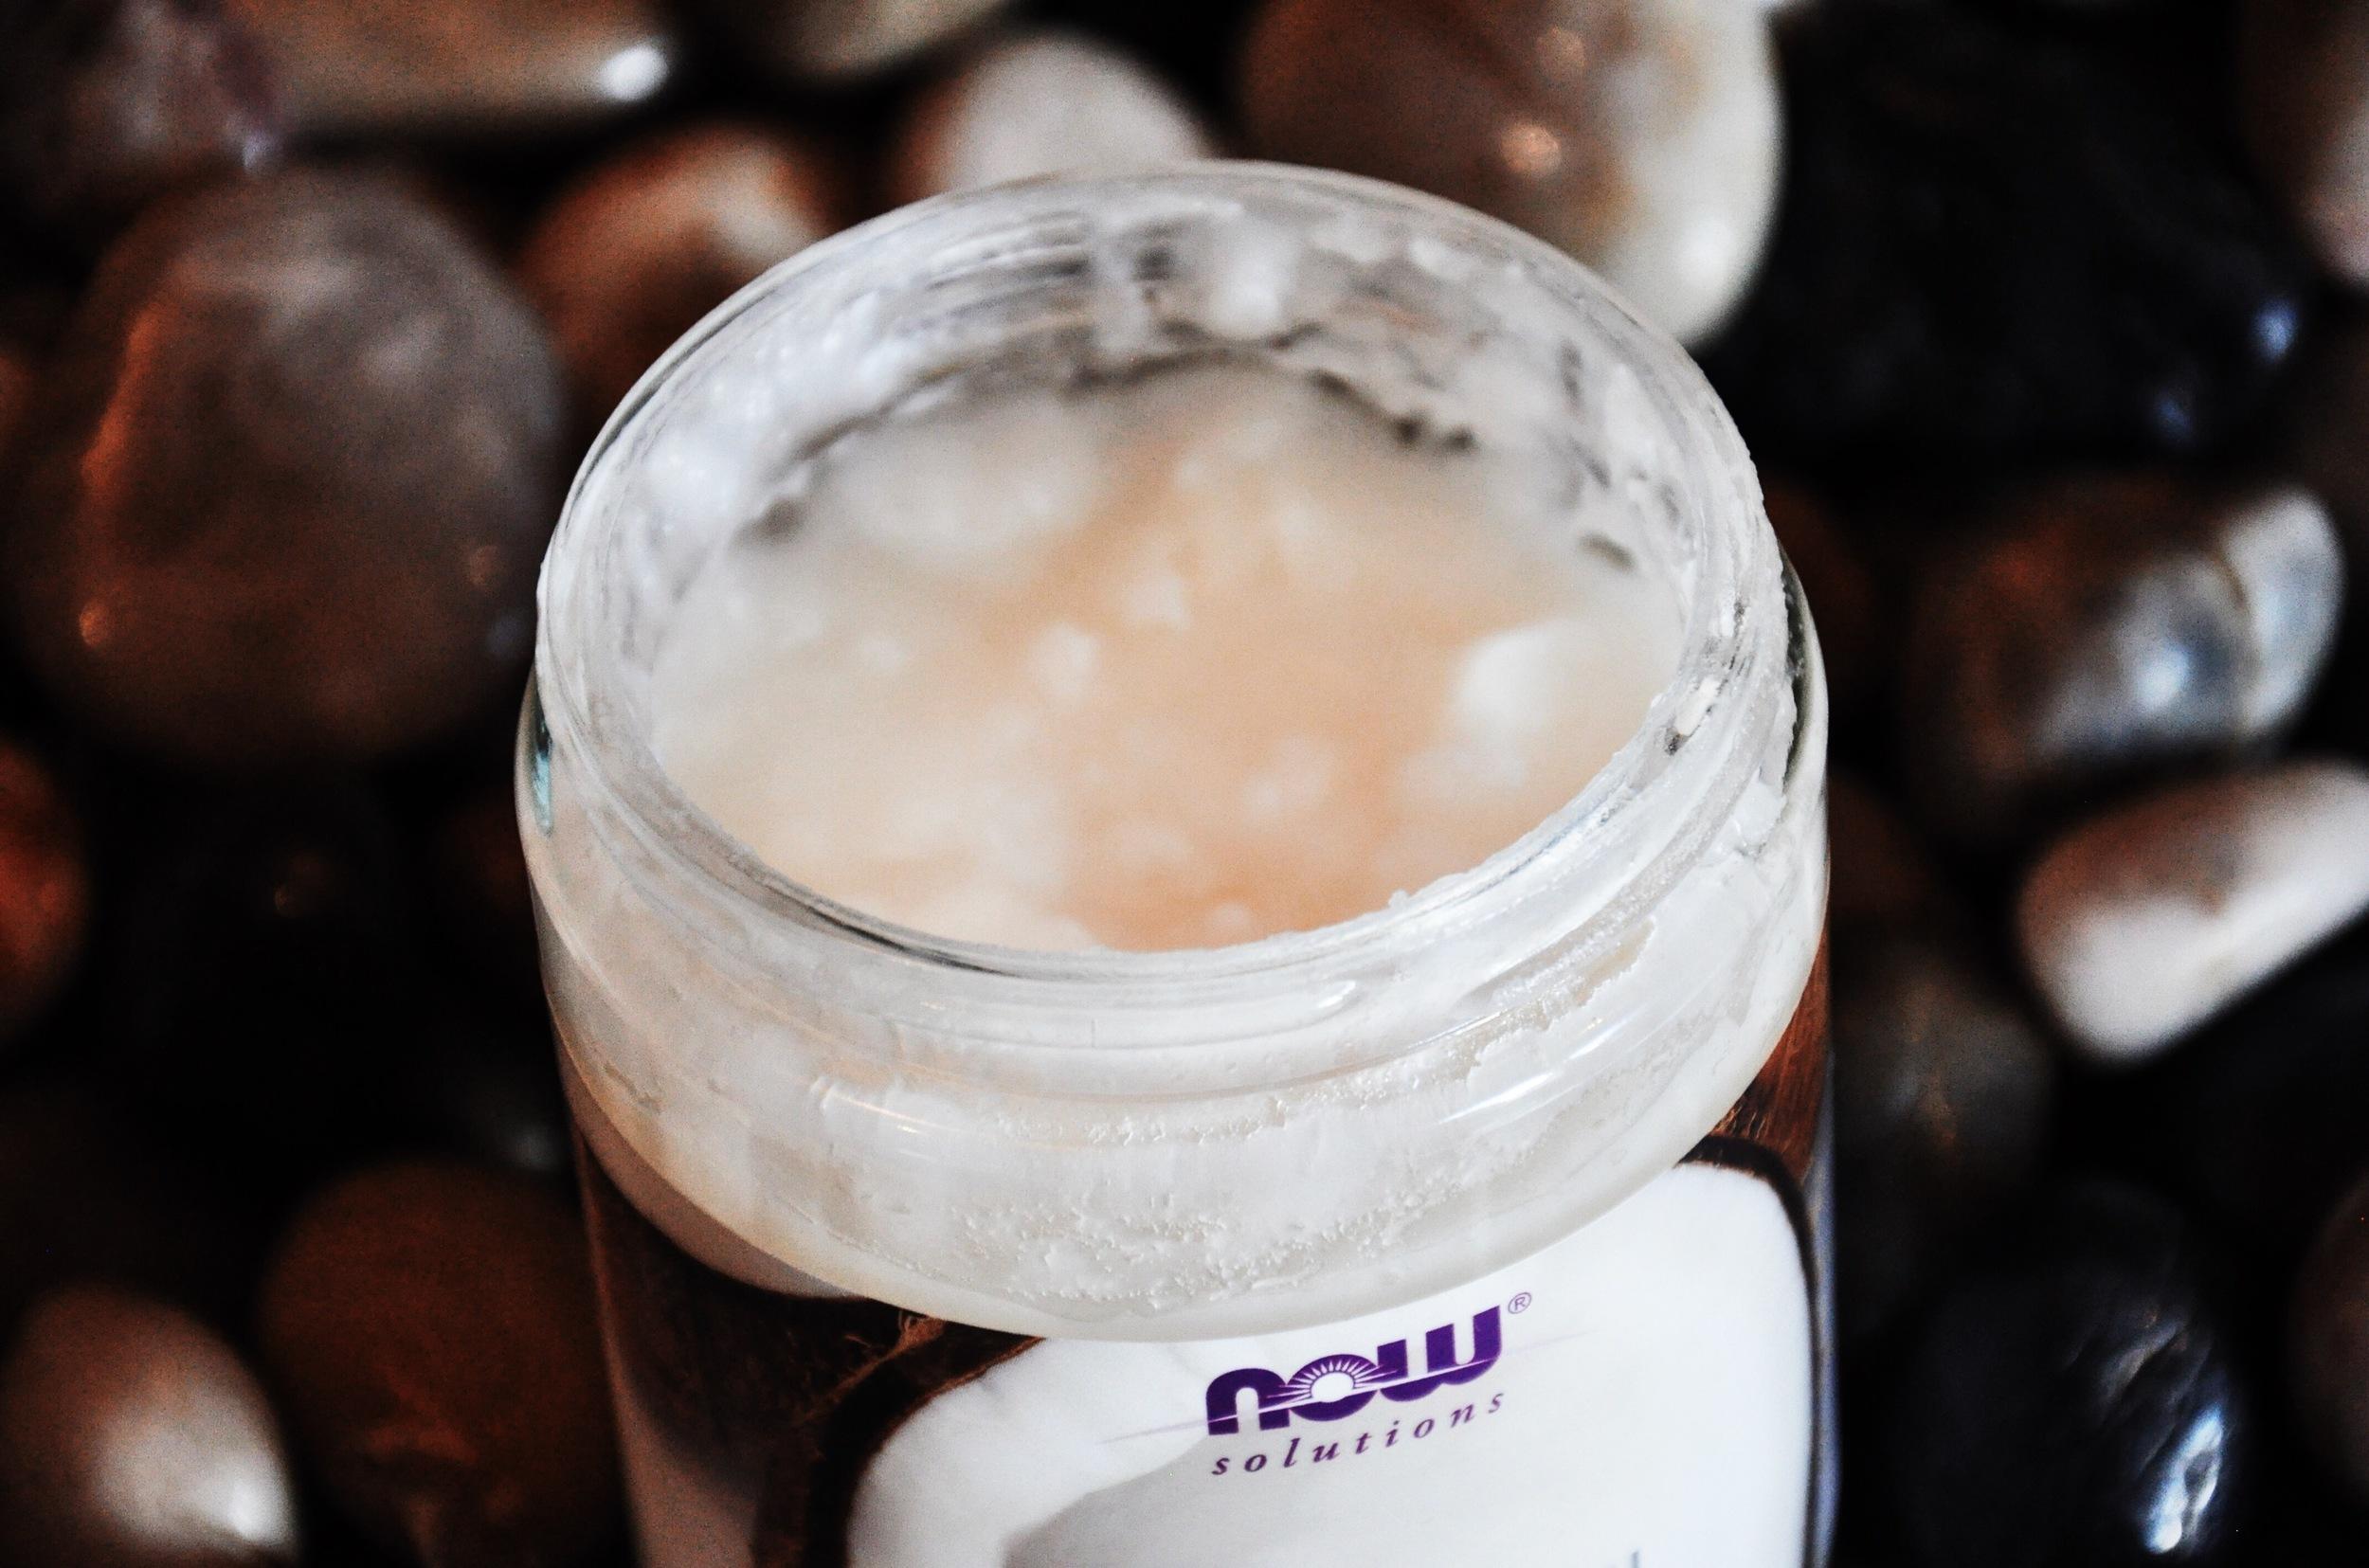 Coconut Oil Close-Up